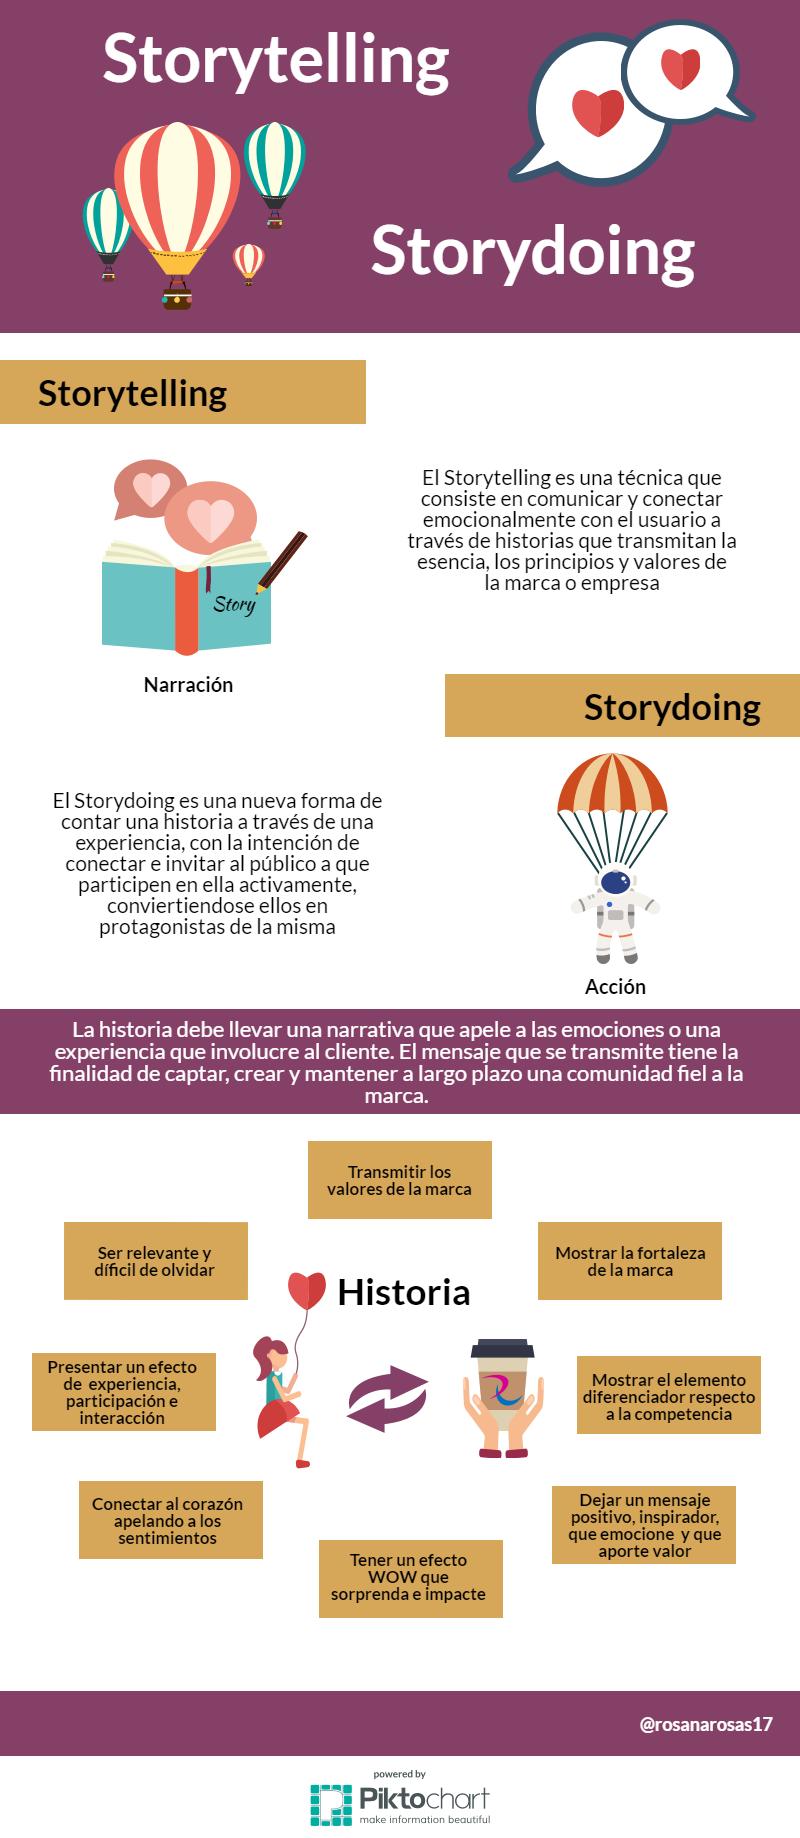 Storytelling vs Storydoing #infografia #infographic #marketing